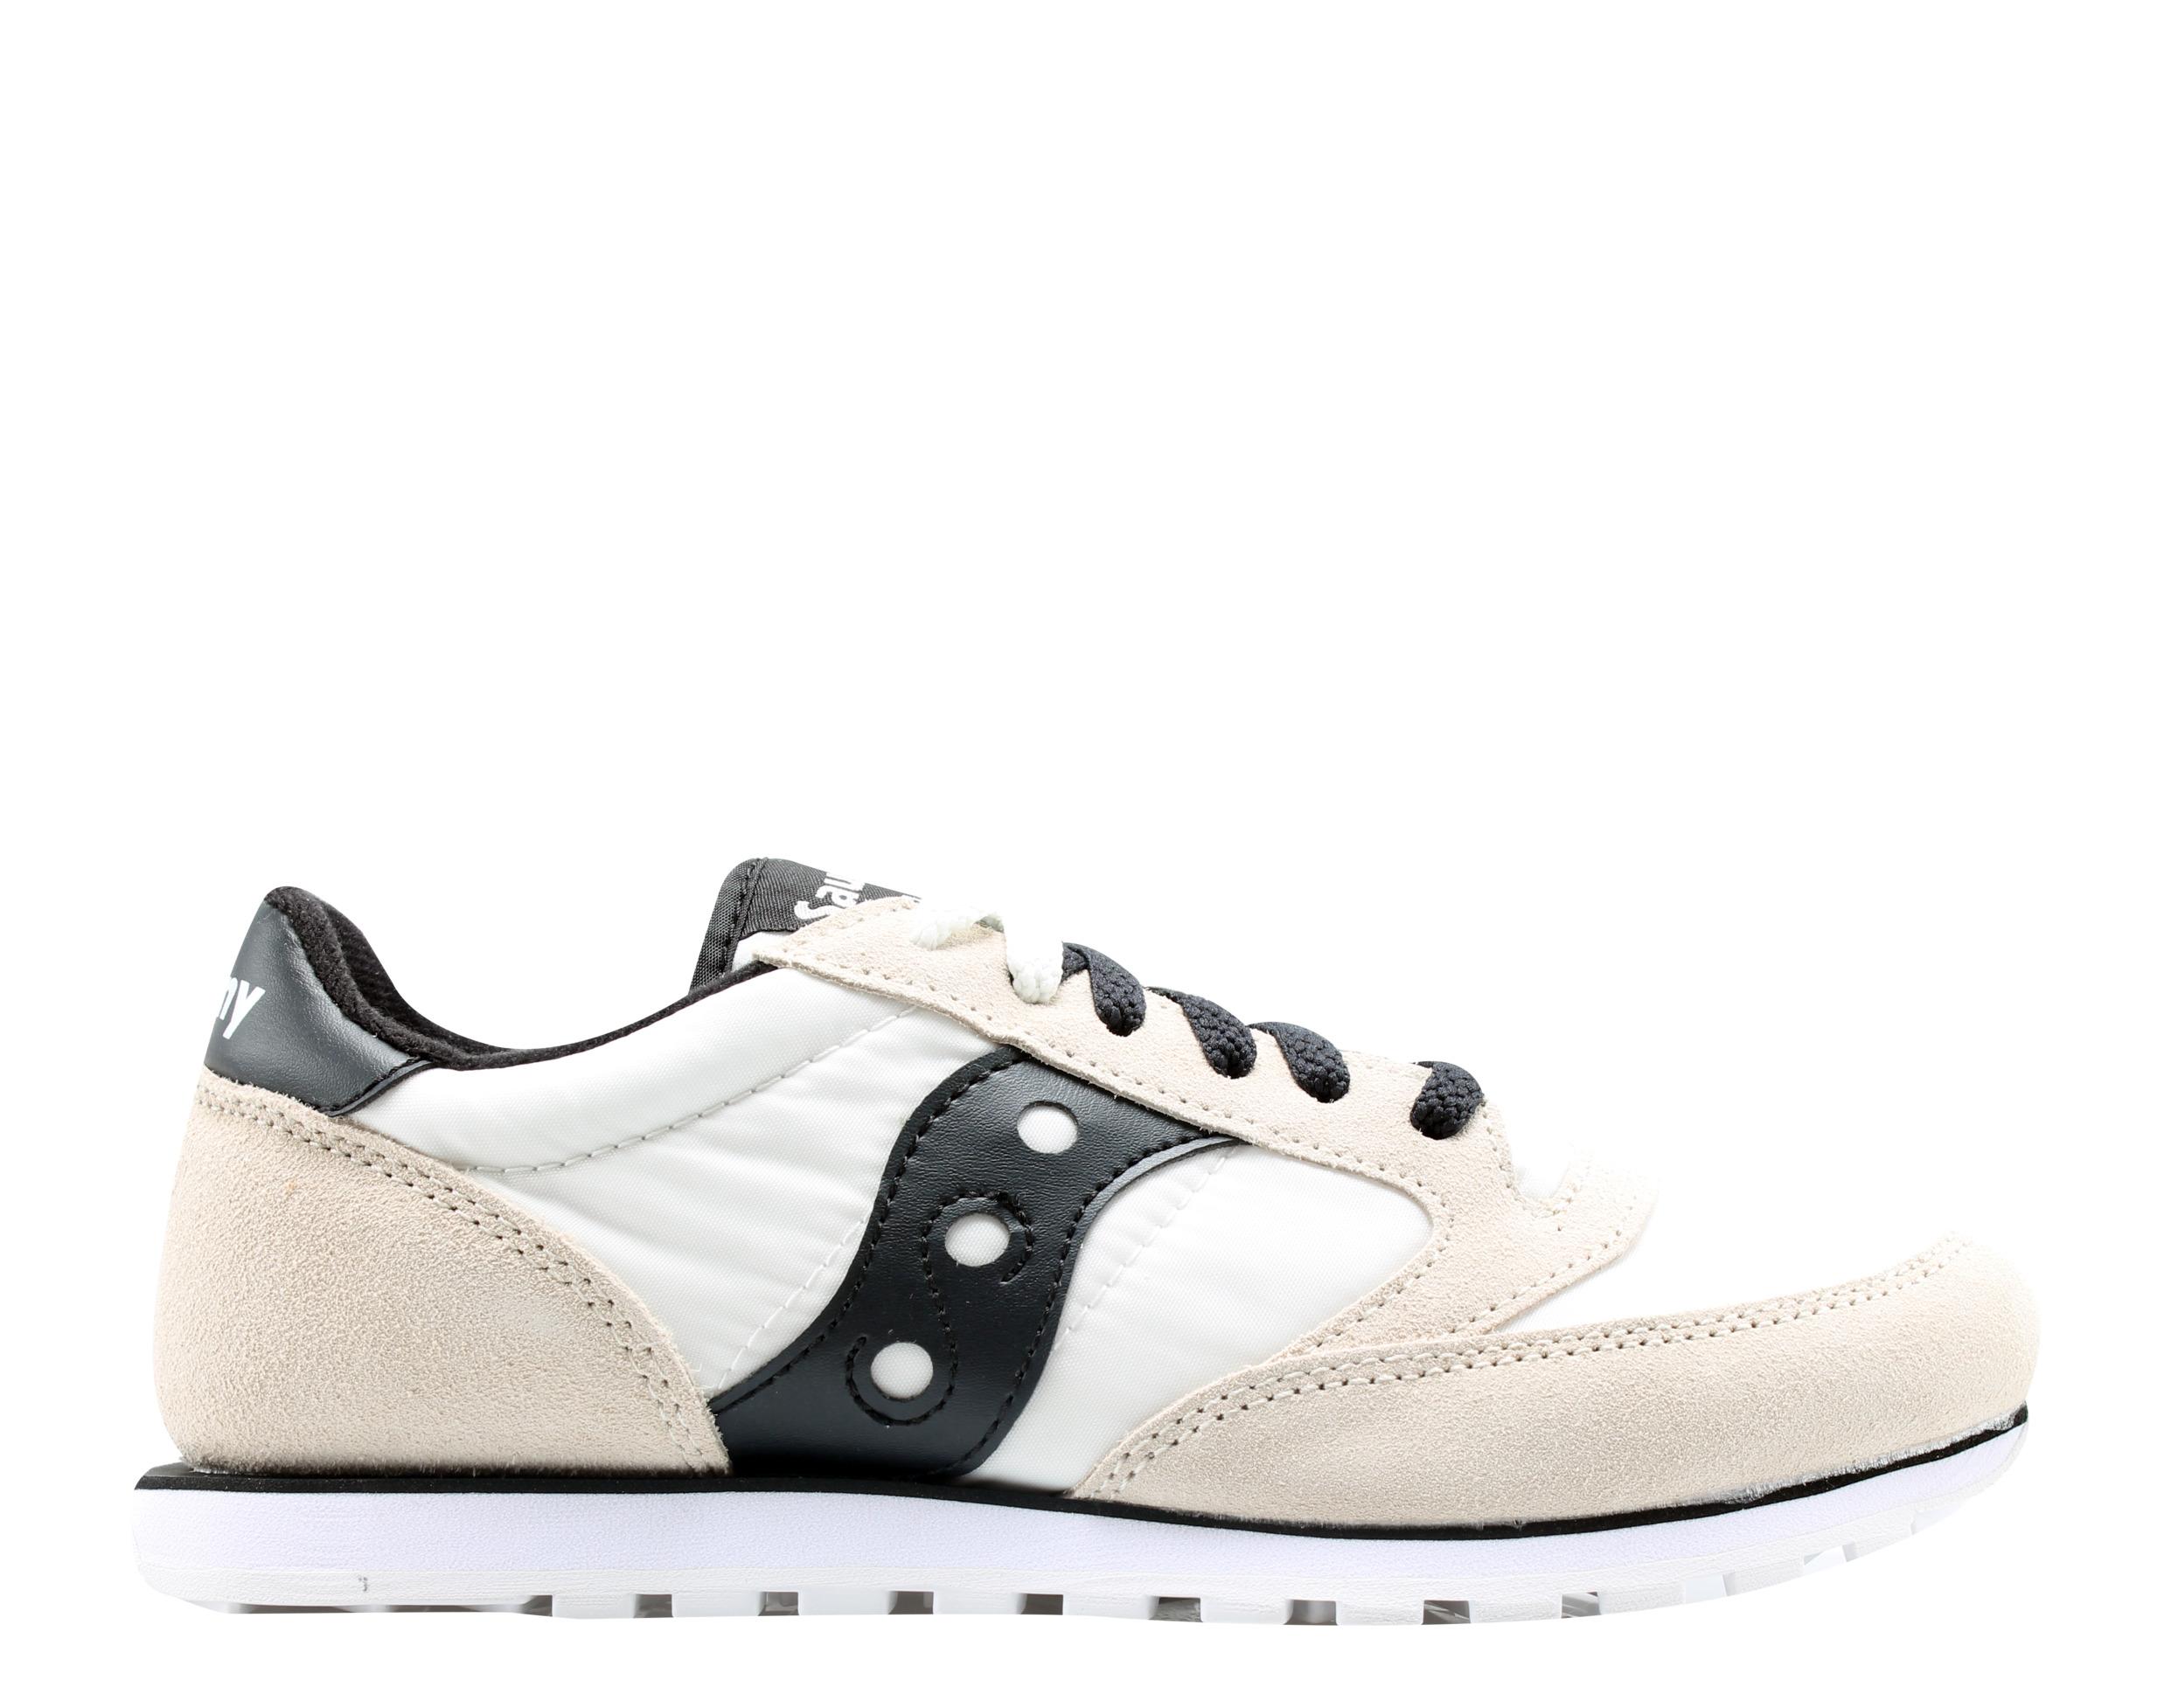 Saucony Jazz Low Pro White/Black Men's Running Shoes 2866-238